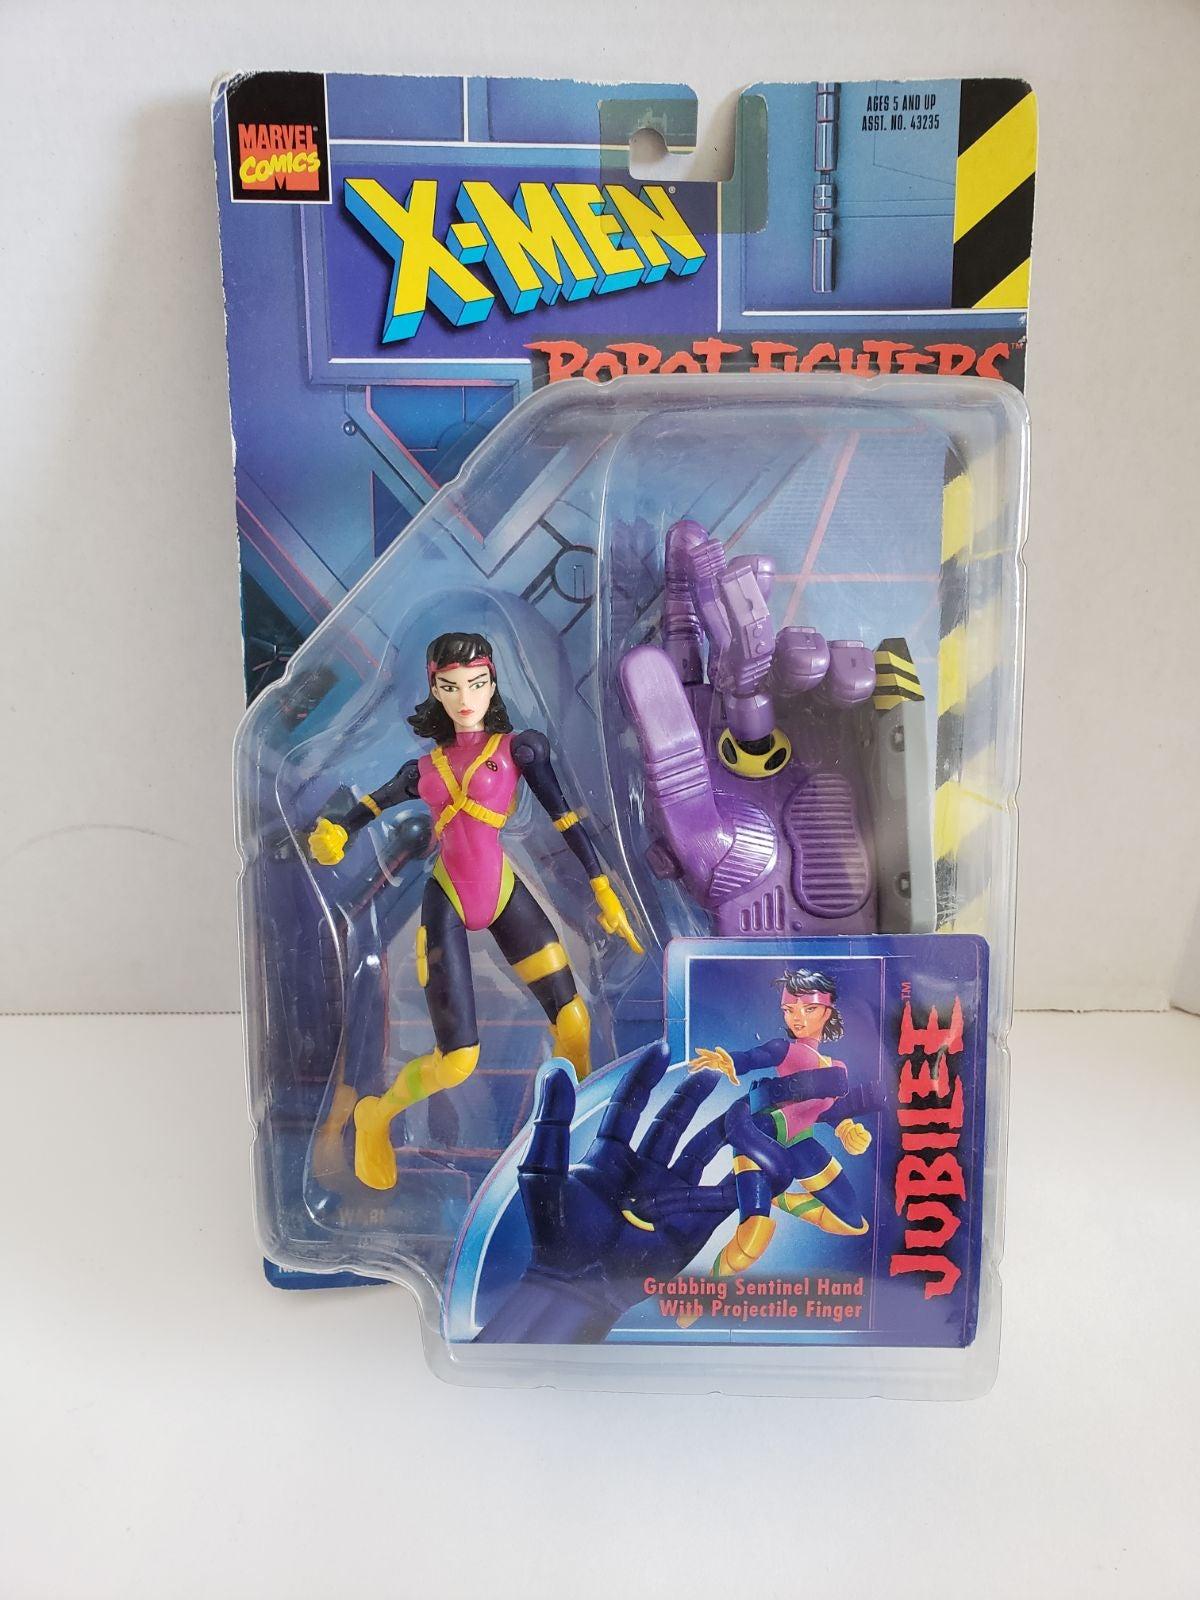 X-men Action Figure - Jubilee